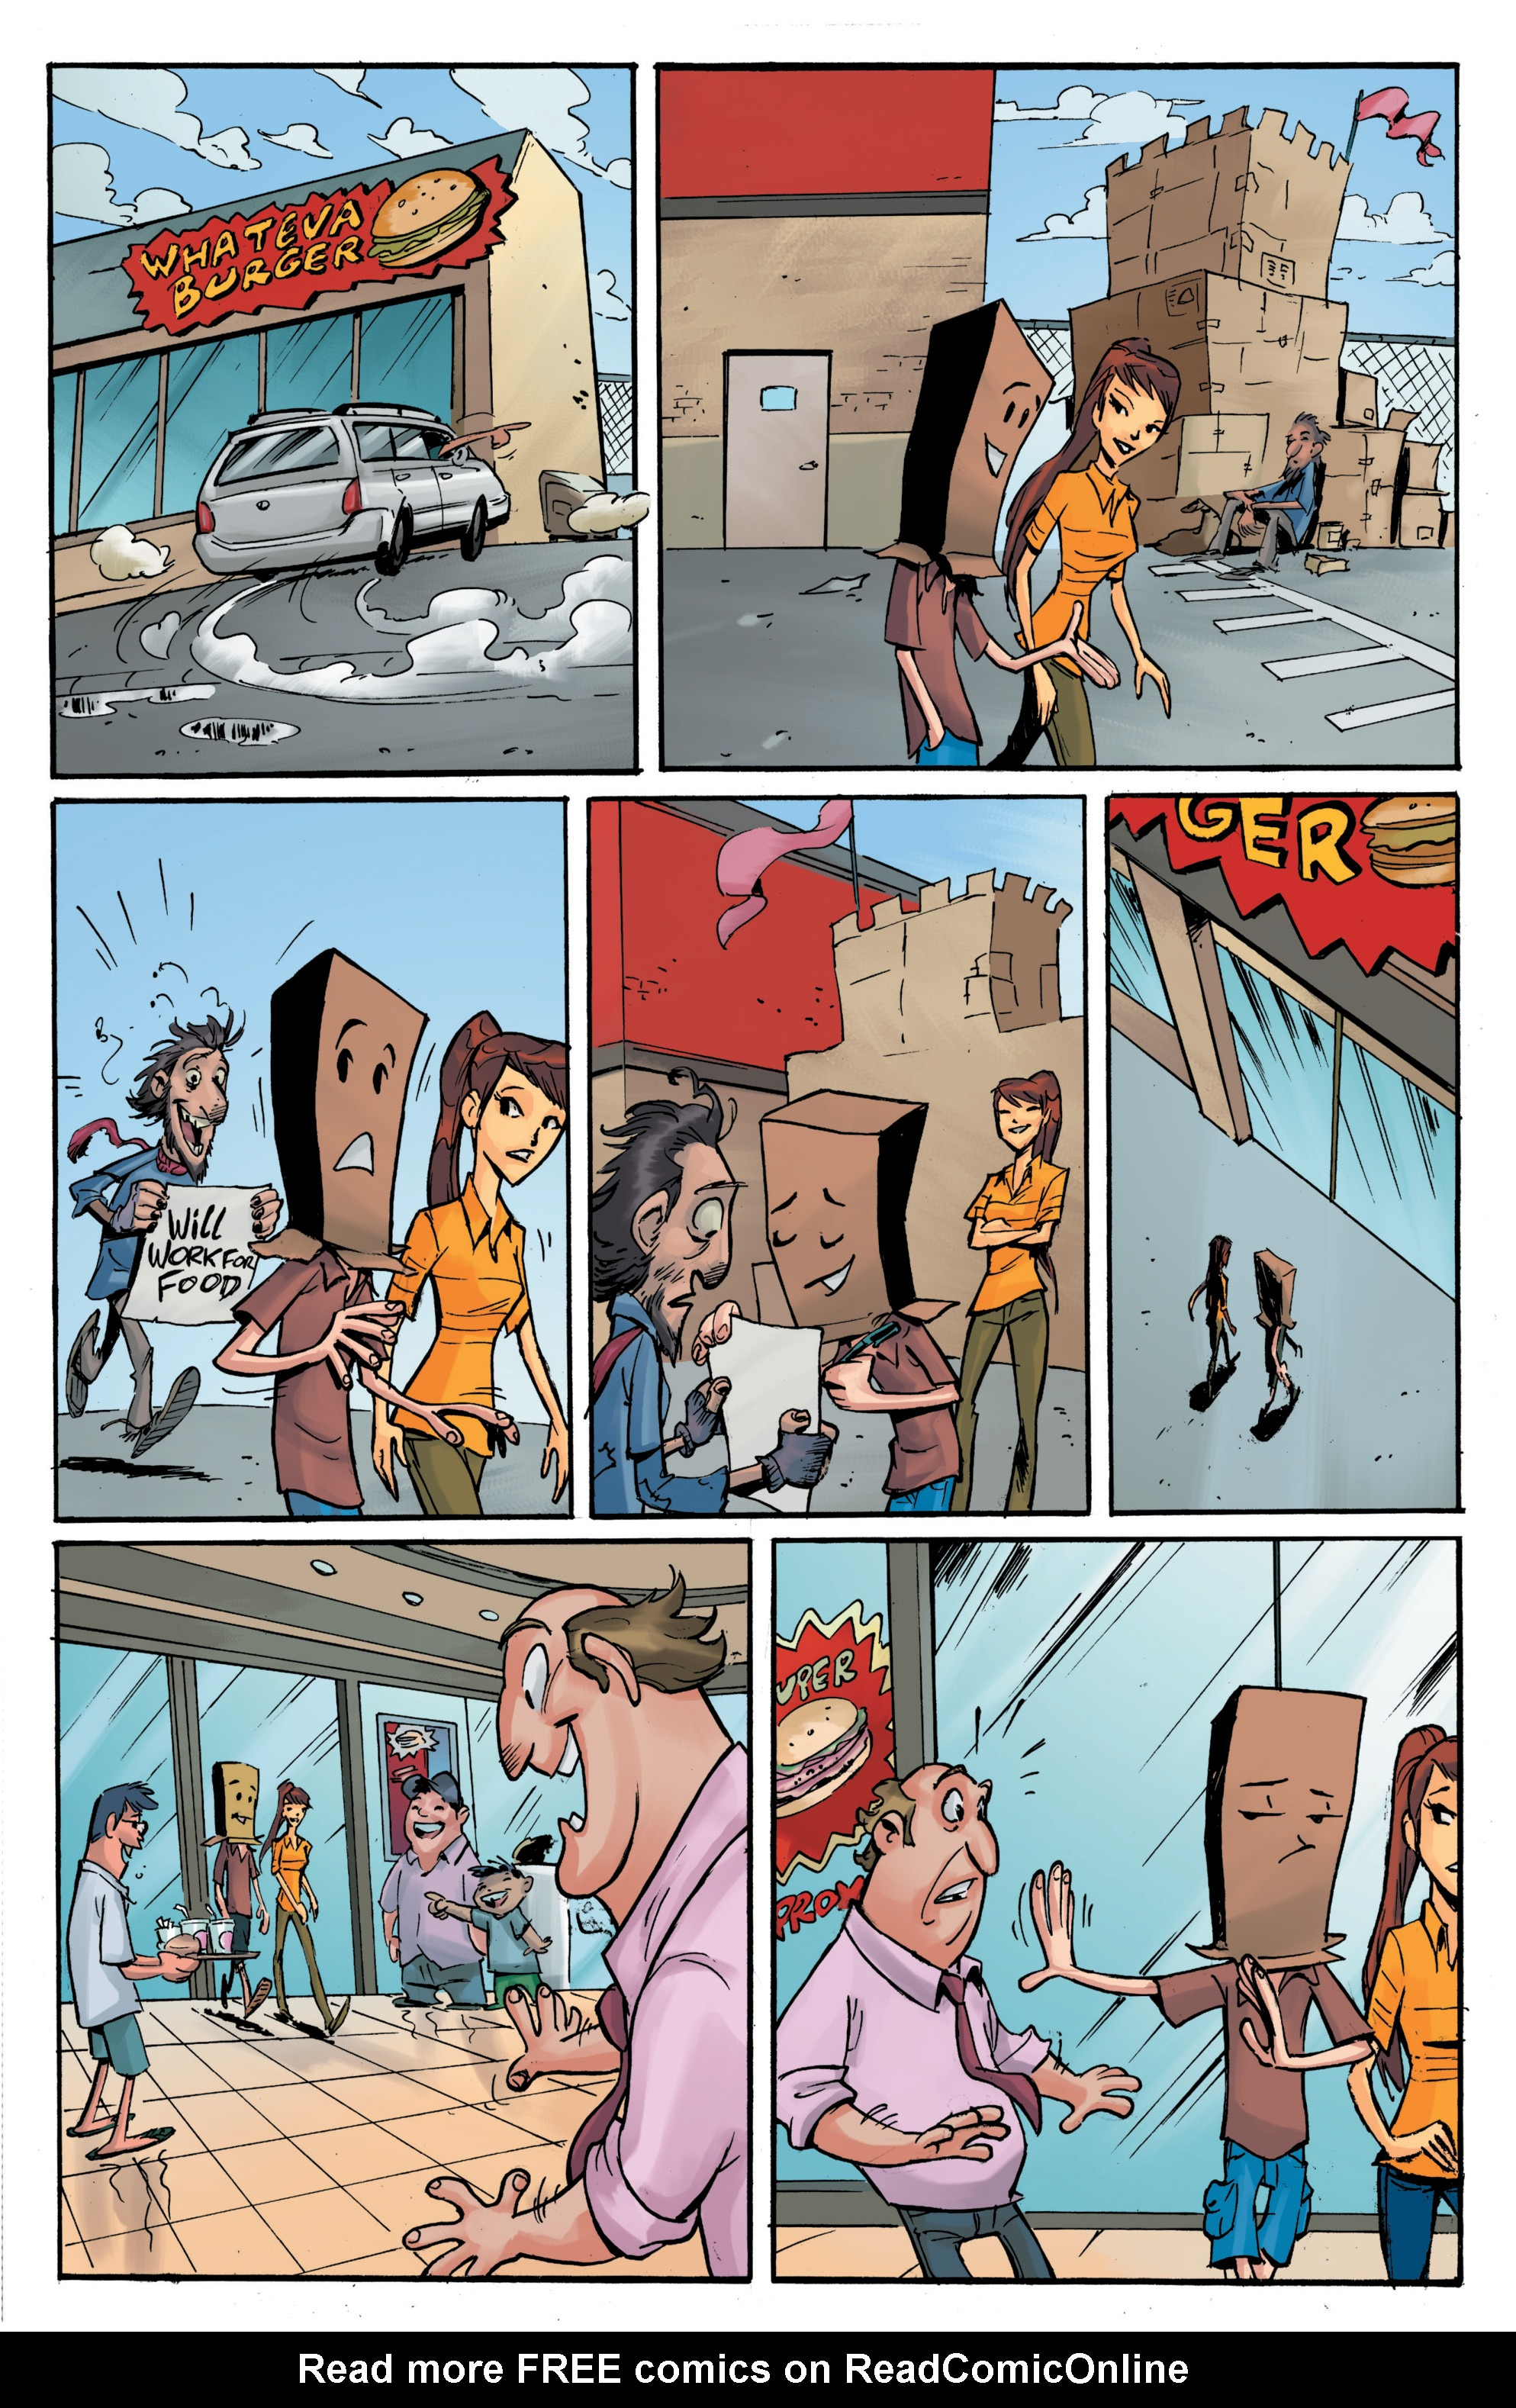 Read online Smosh comic -  Issue #5 - 11